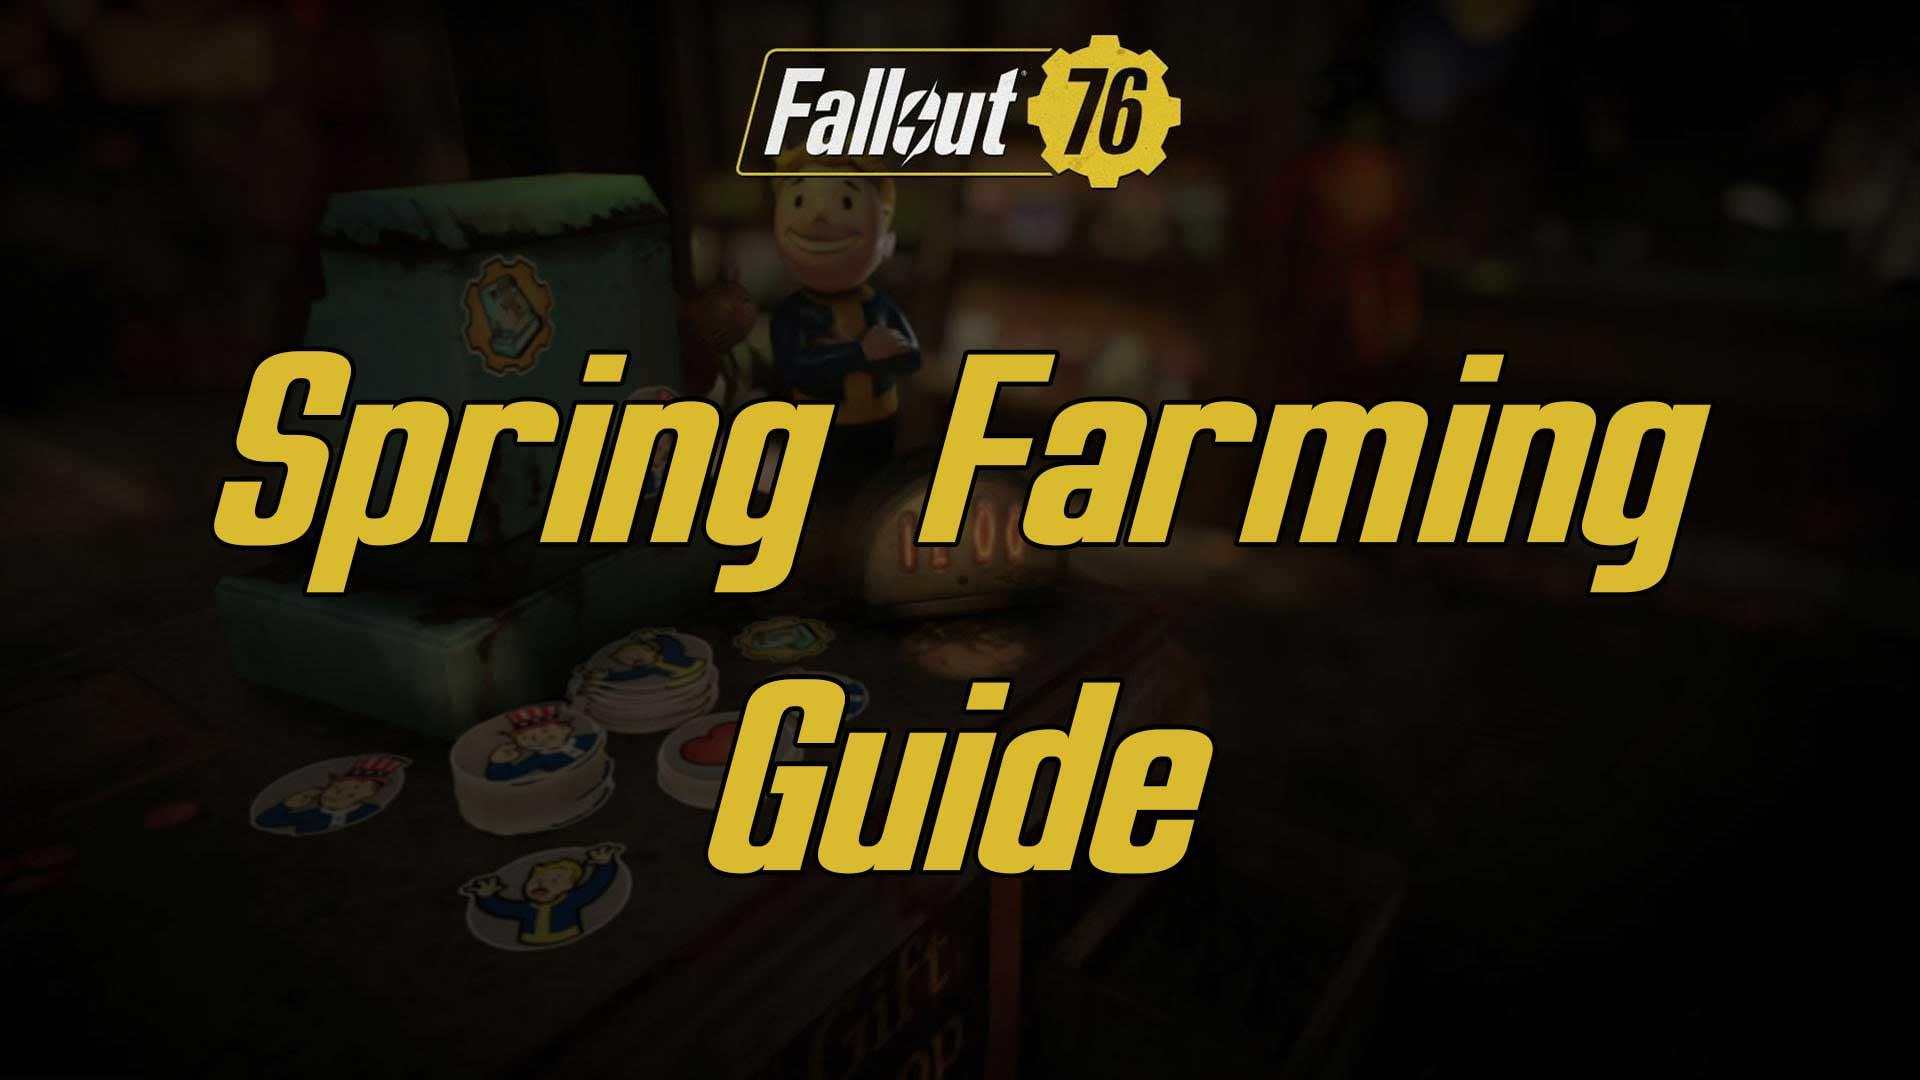 Spring Farming Guide fallout 76